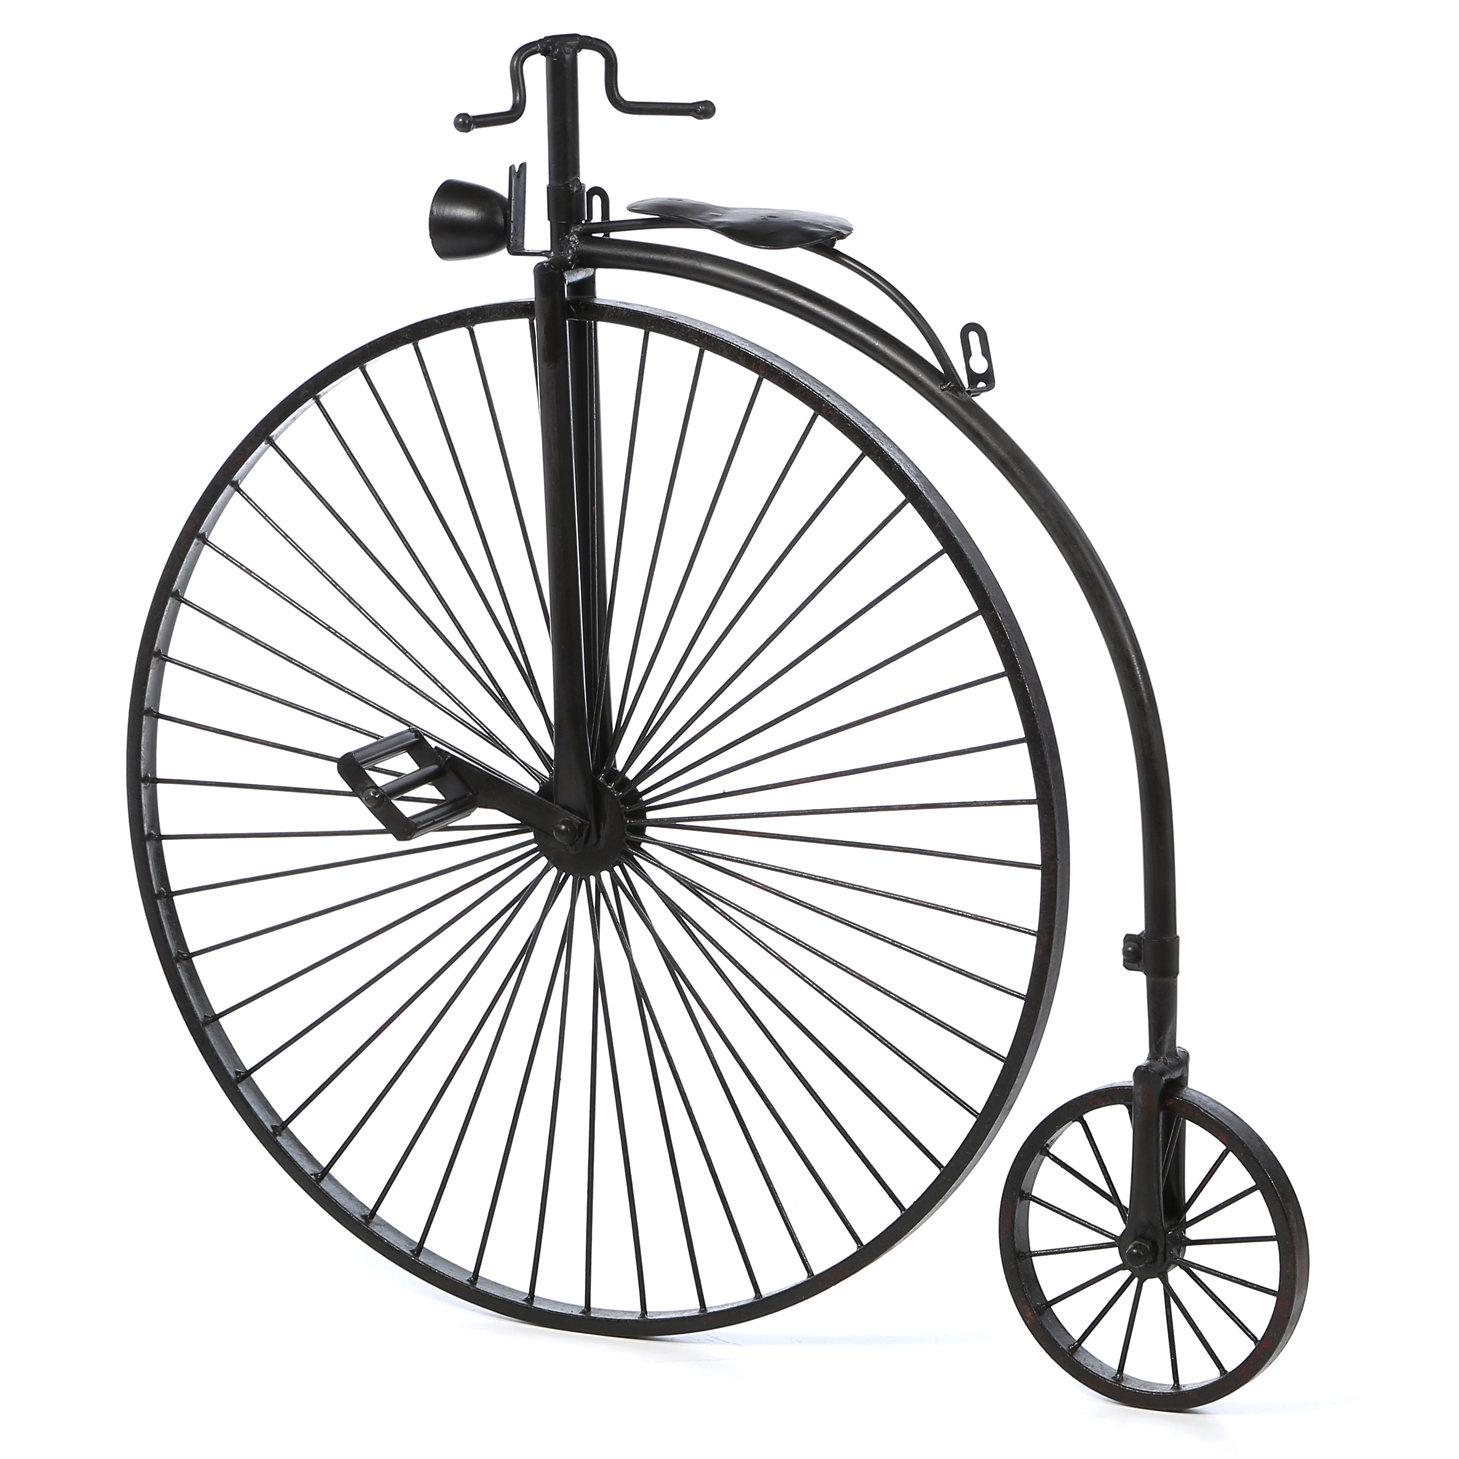 Joss & Main pertaining to Fashionable Metal Bicycle Wall Decor